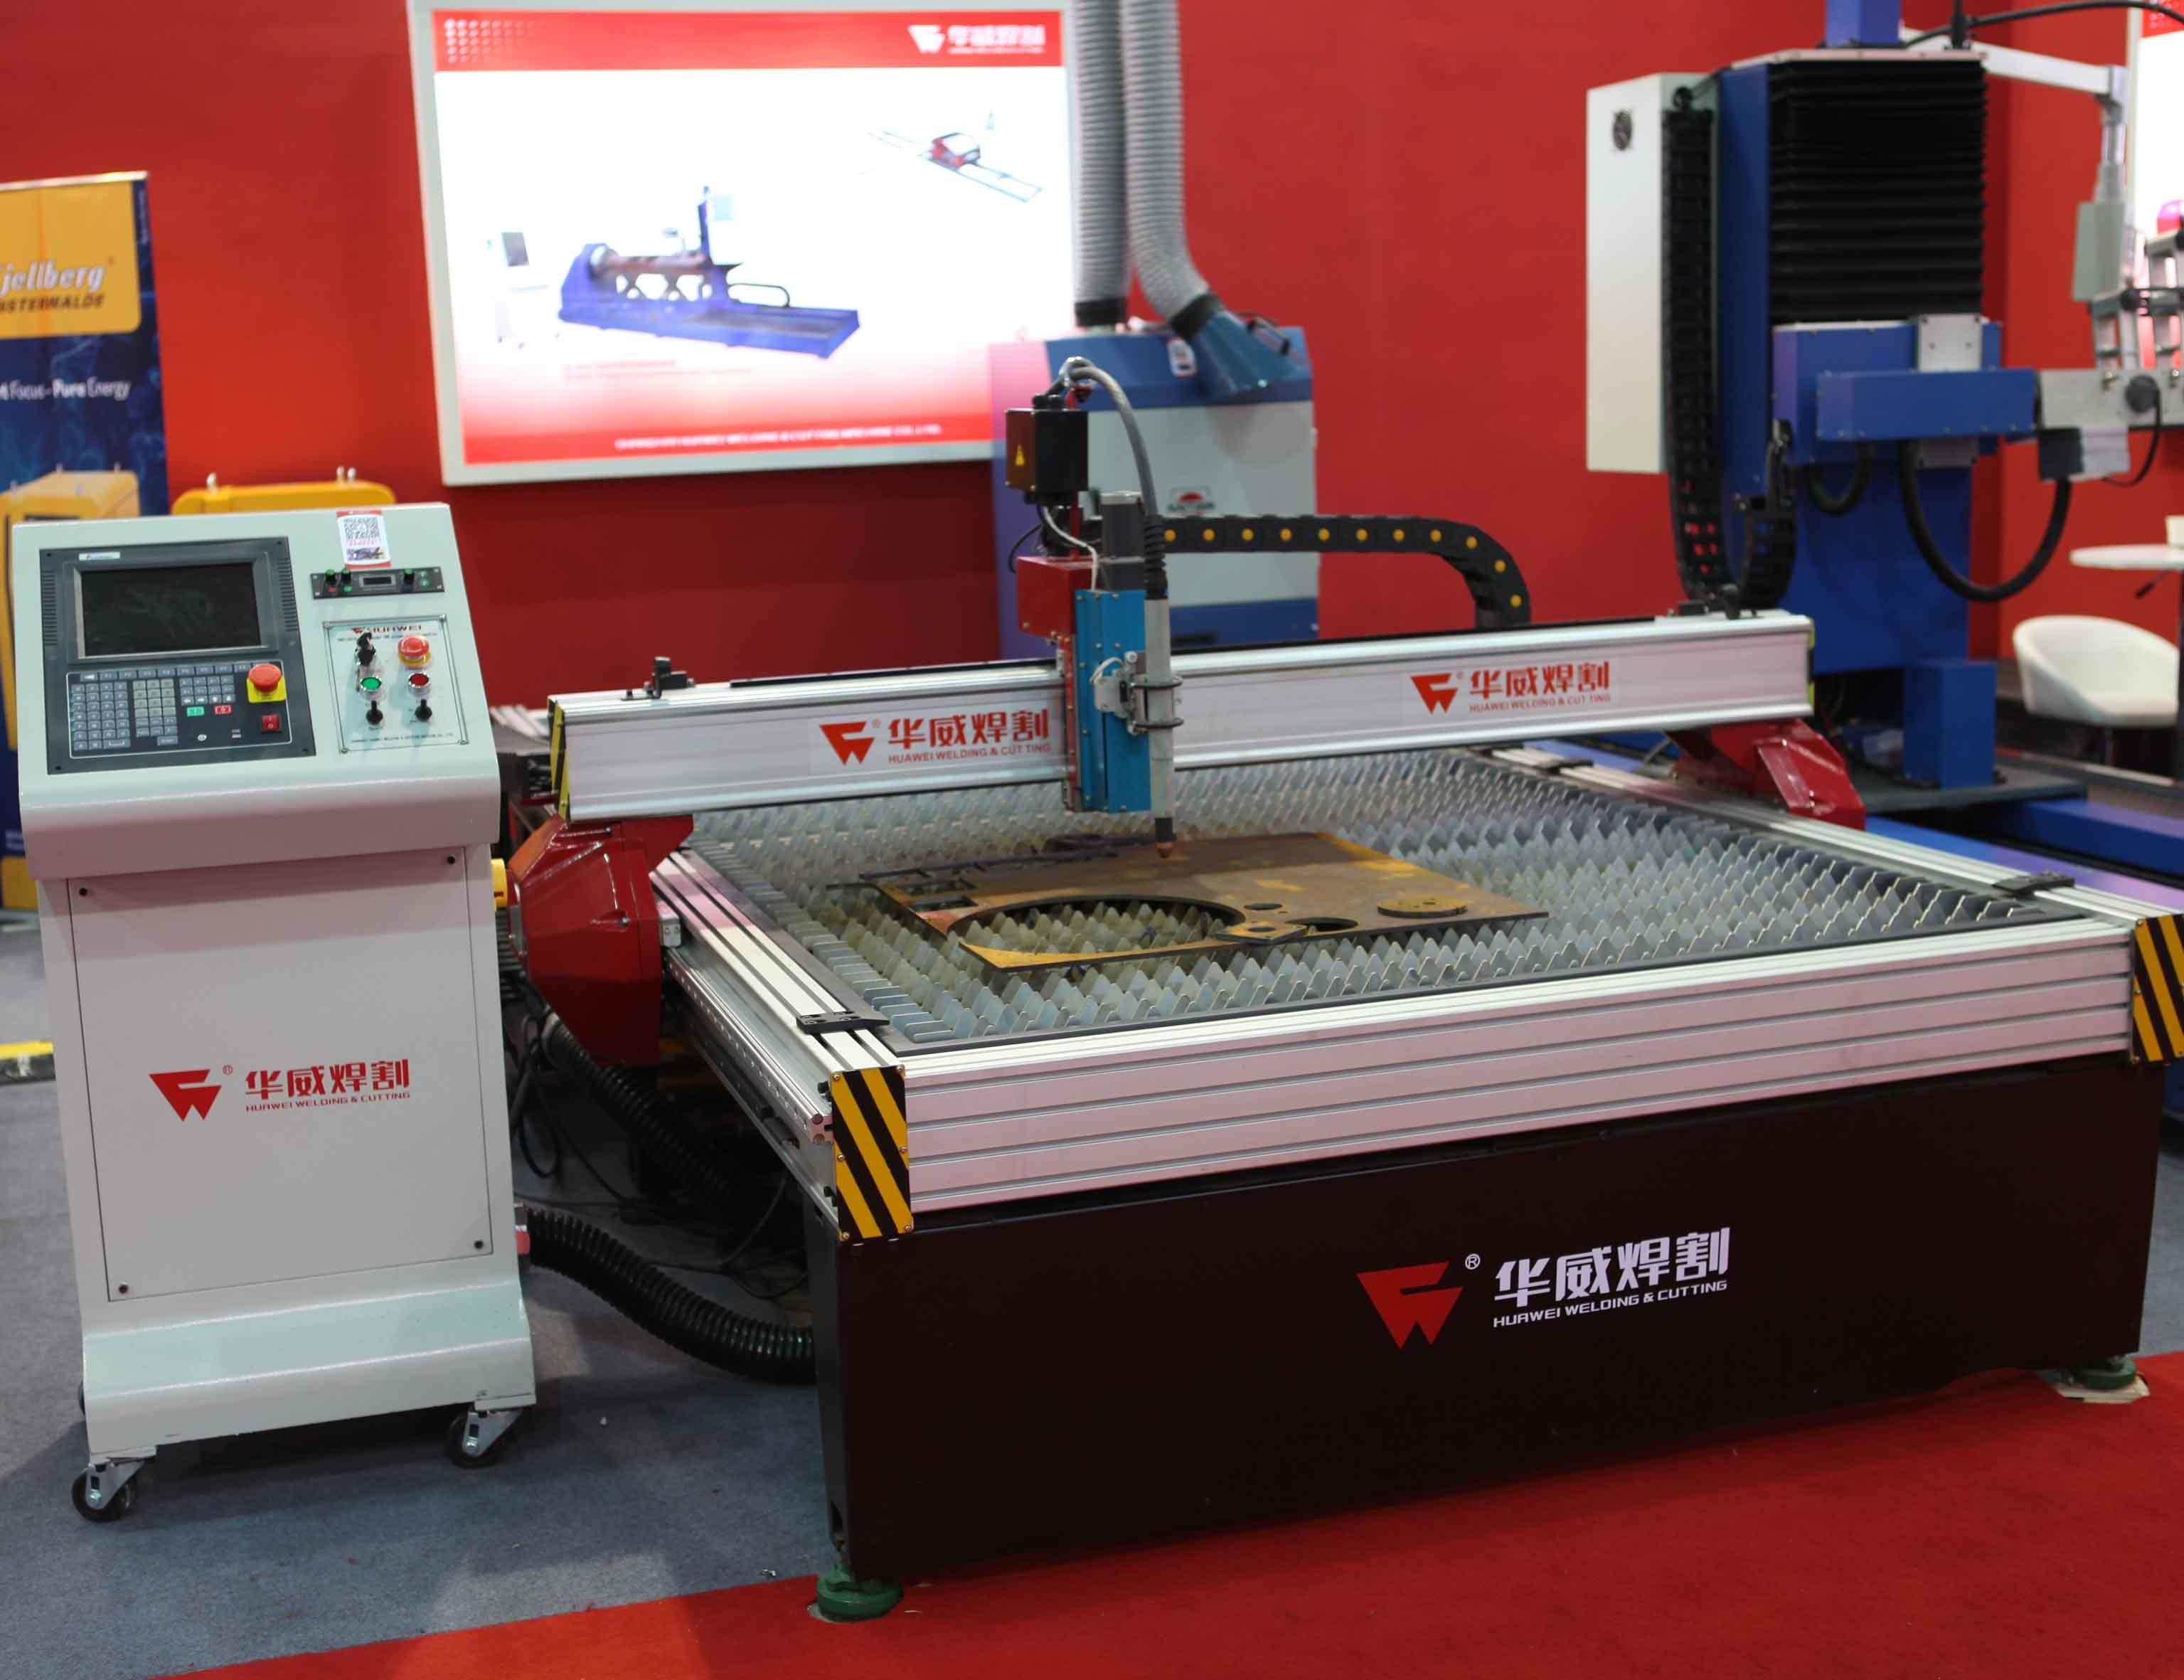 TNC-3015 Economical Low Price Cheap Table Model CNC Plasma Flame Gas Cutting Machine